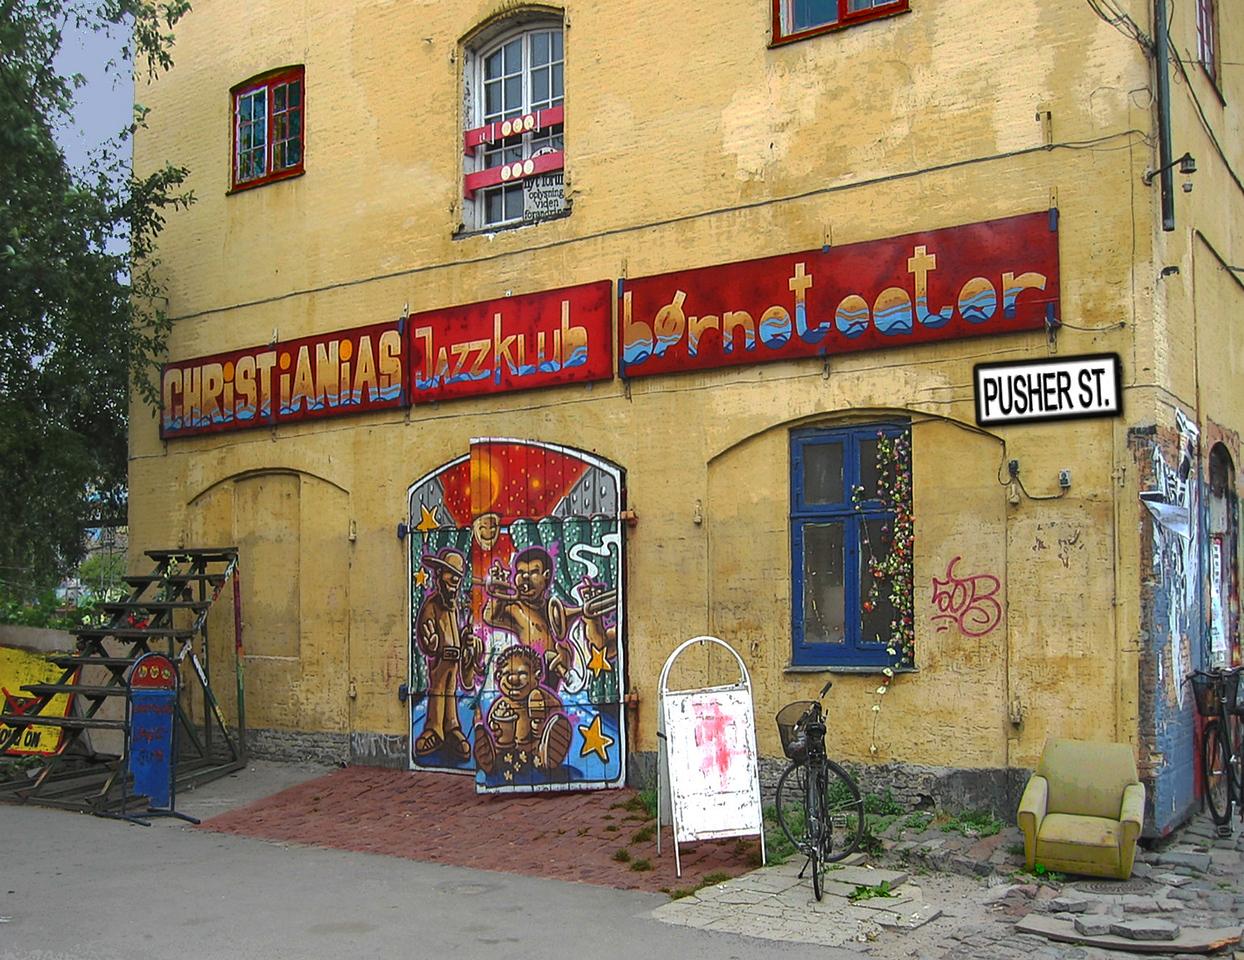 South American Street